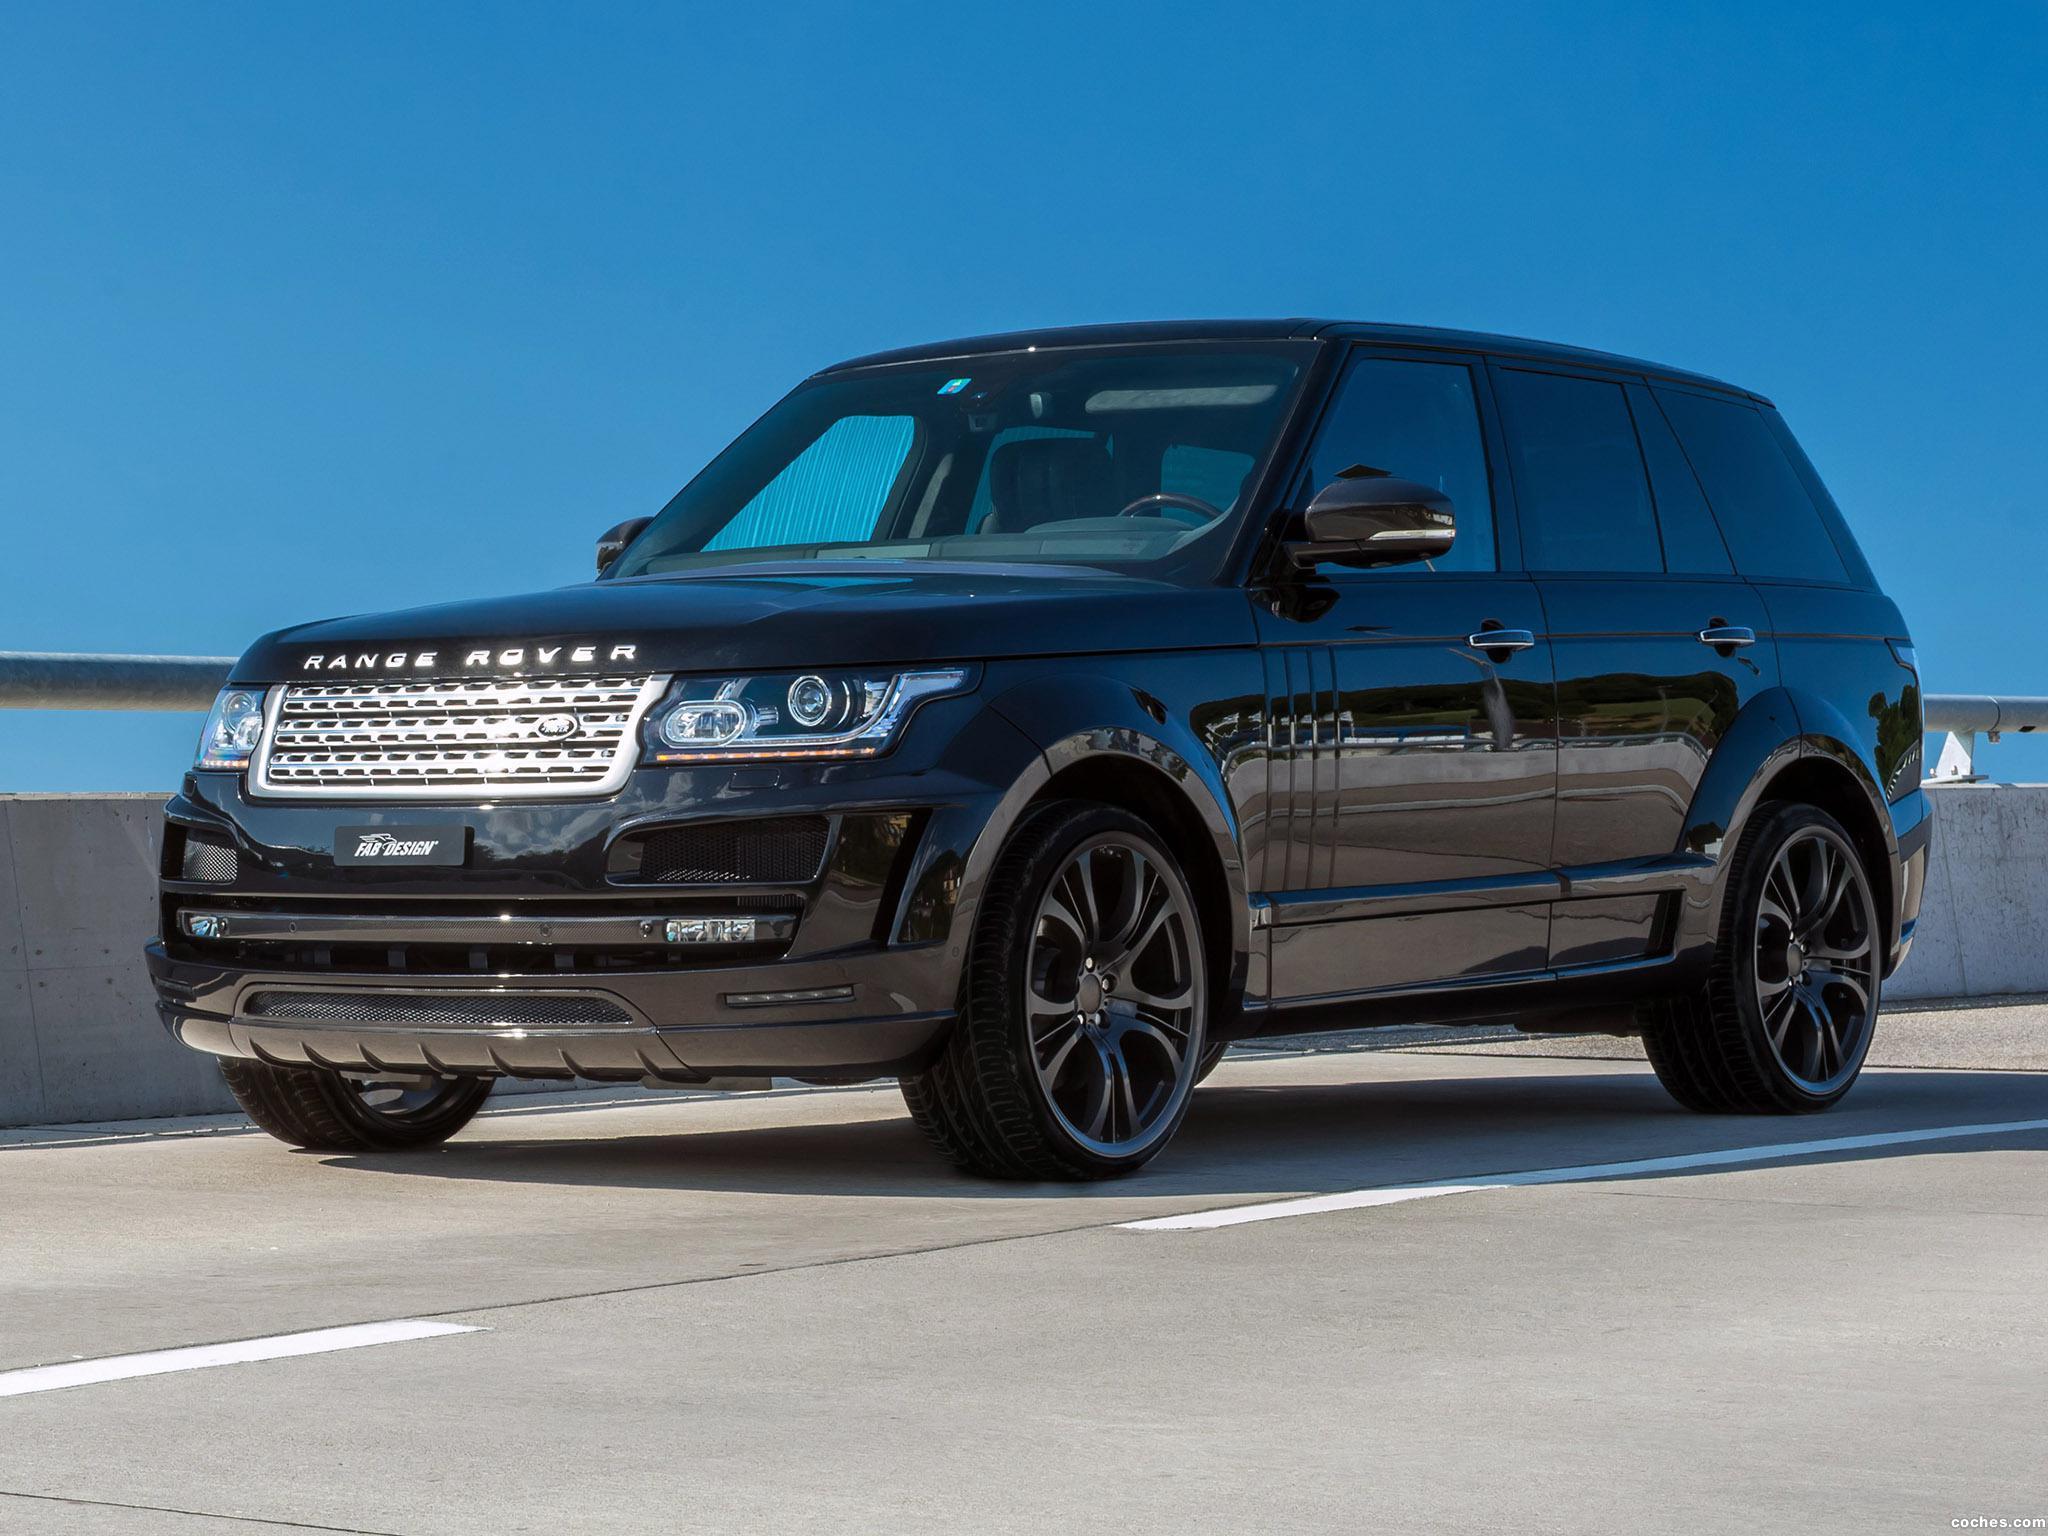 Foto 1 de FAB Design Land Rover Range Rover Noreia L405 2014